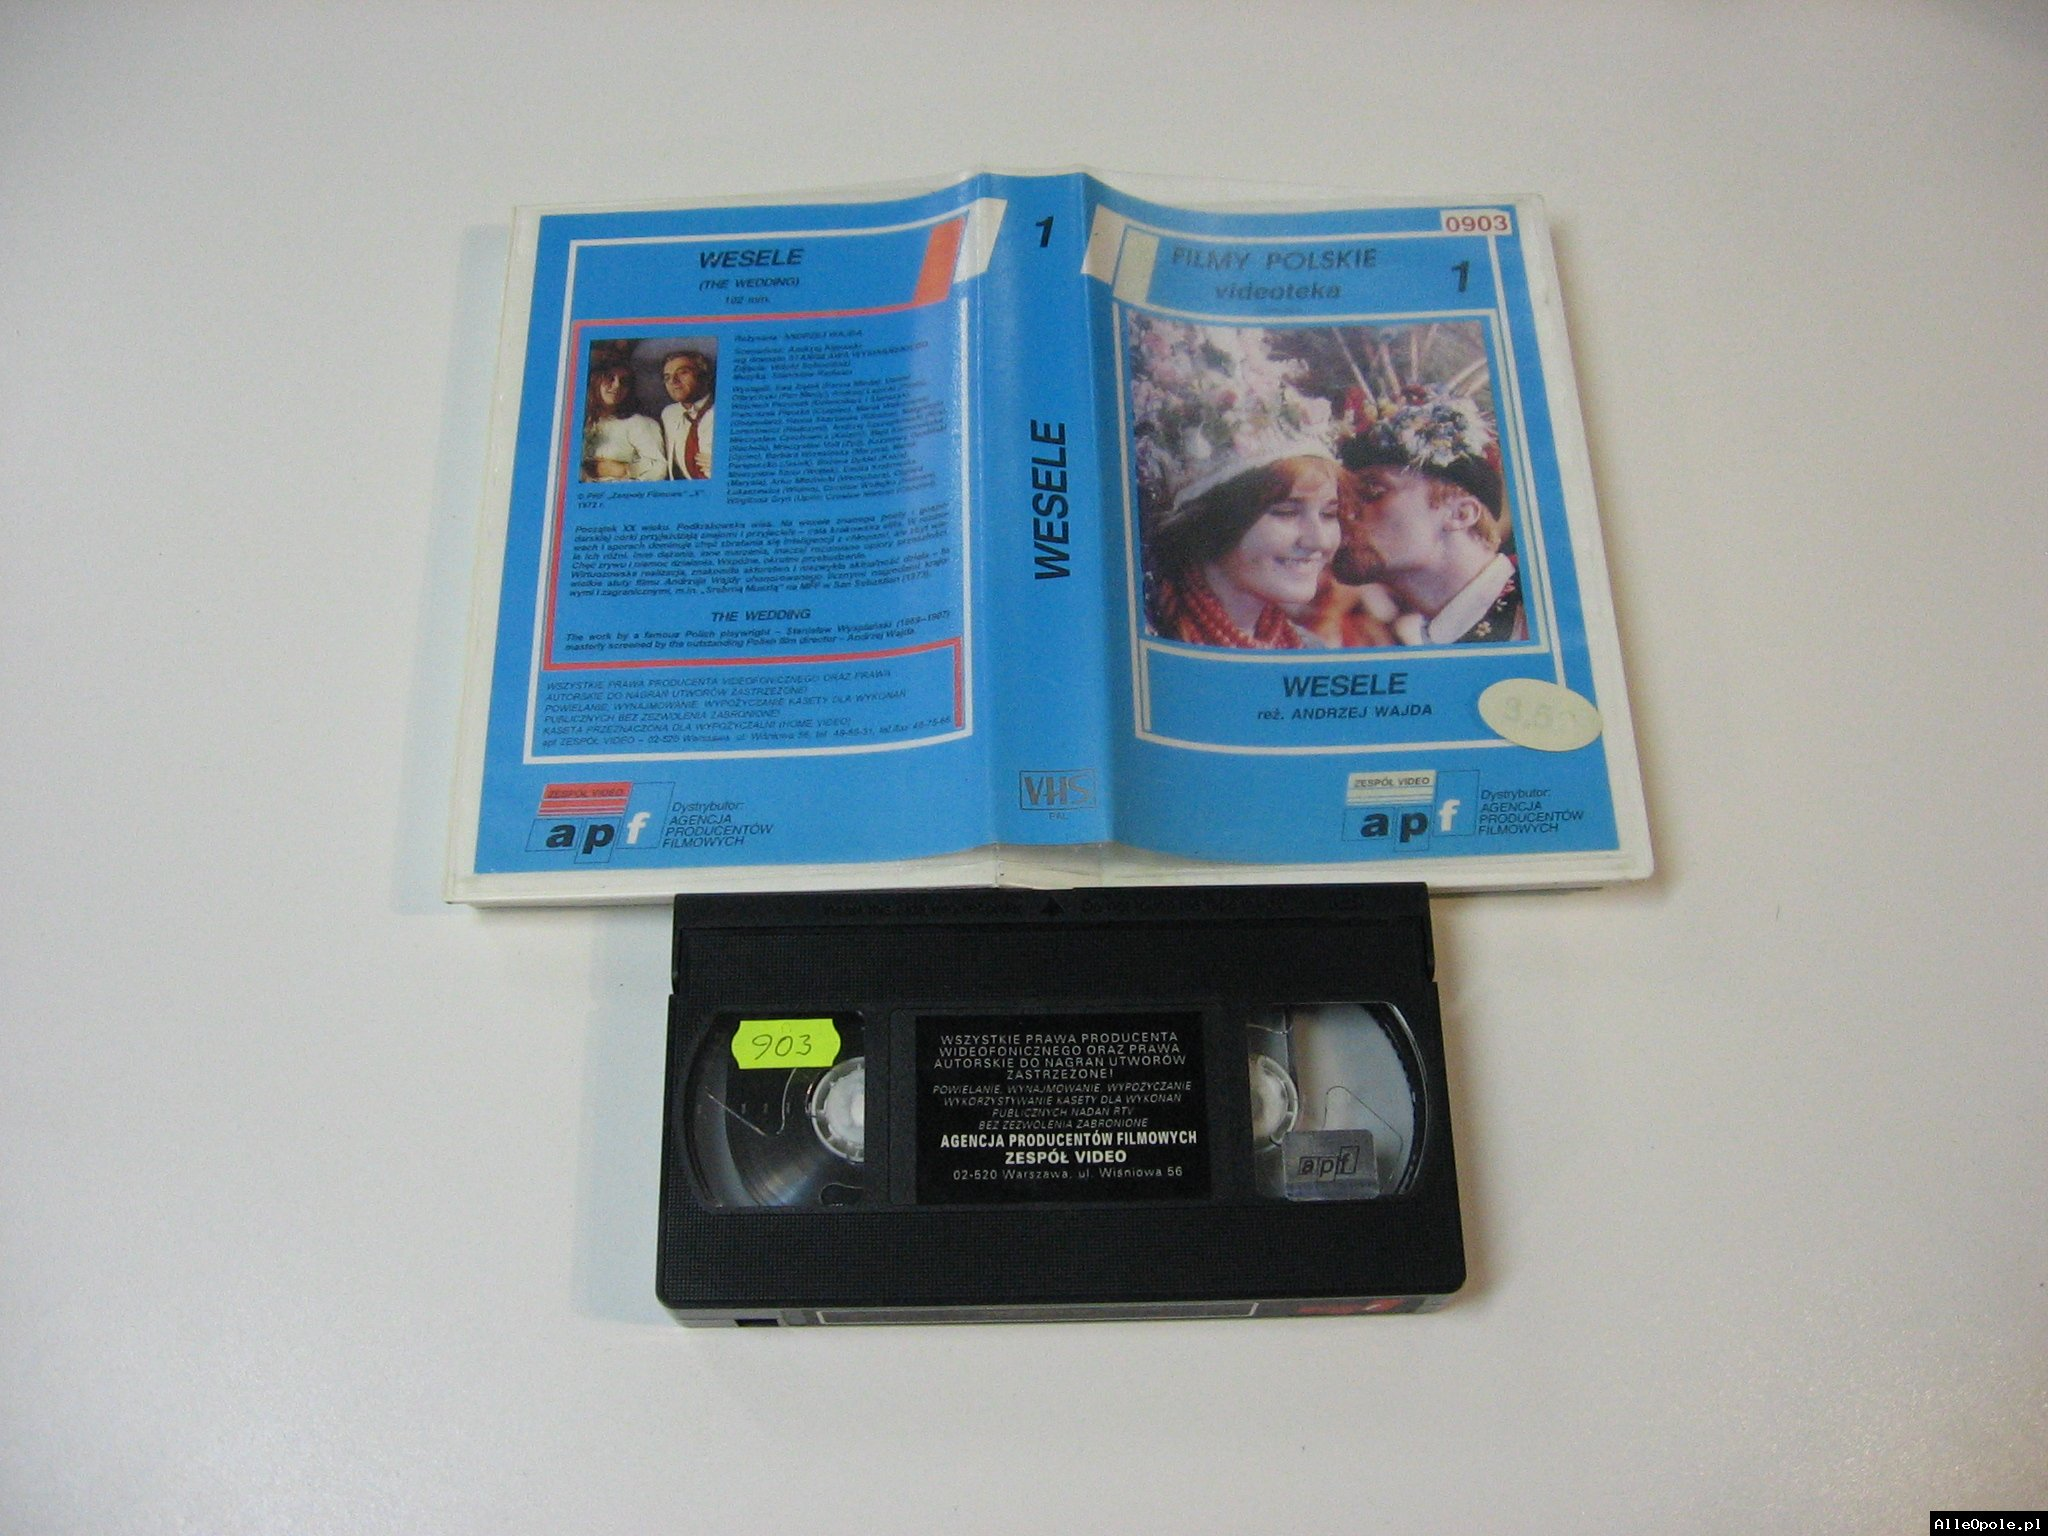 WESELE 1 - ANDRZEJ WAJDA - VHS Kaseta Video - Opole 1782